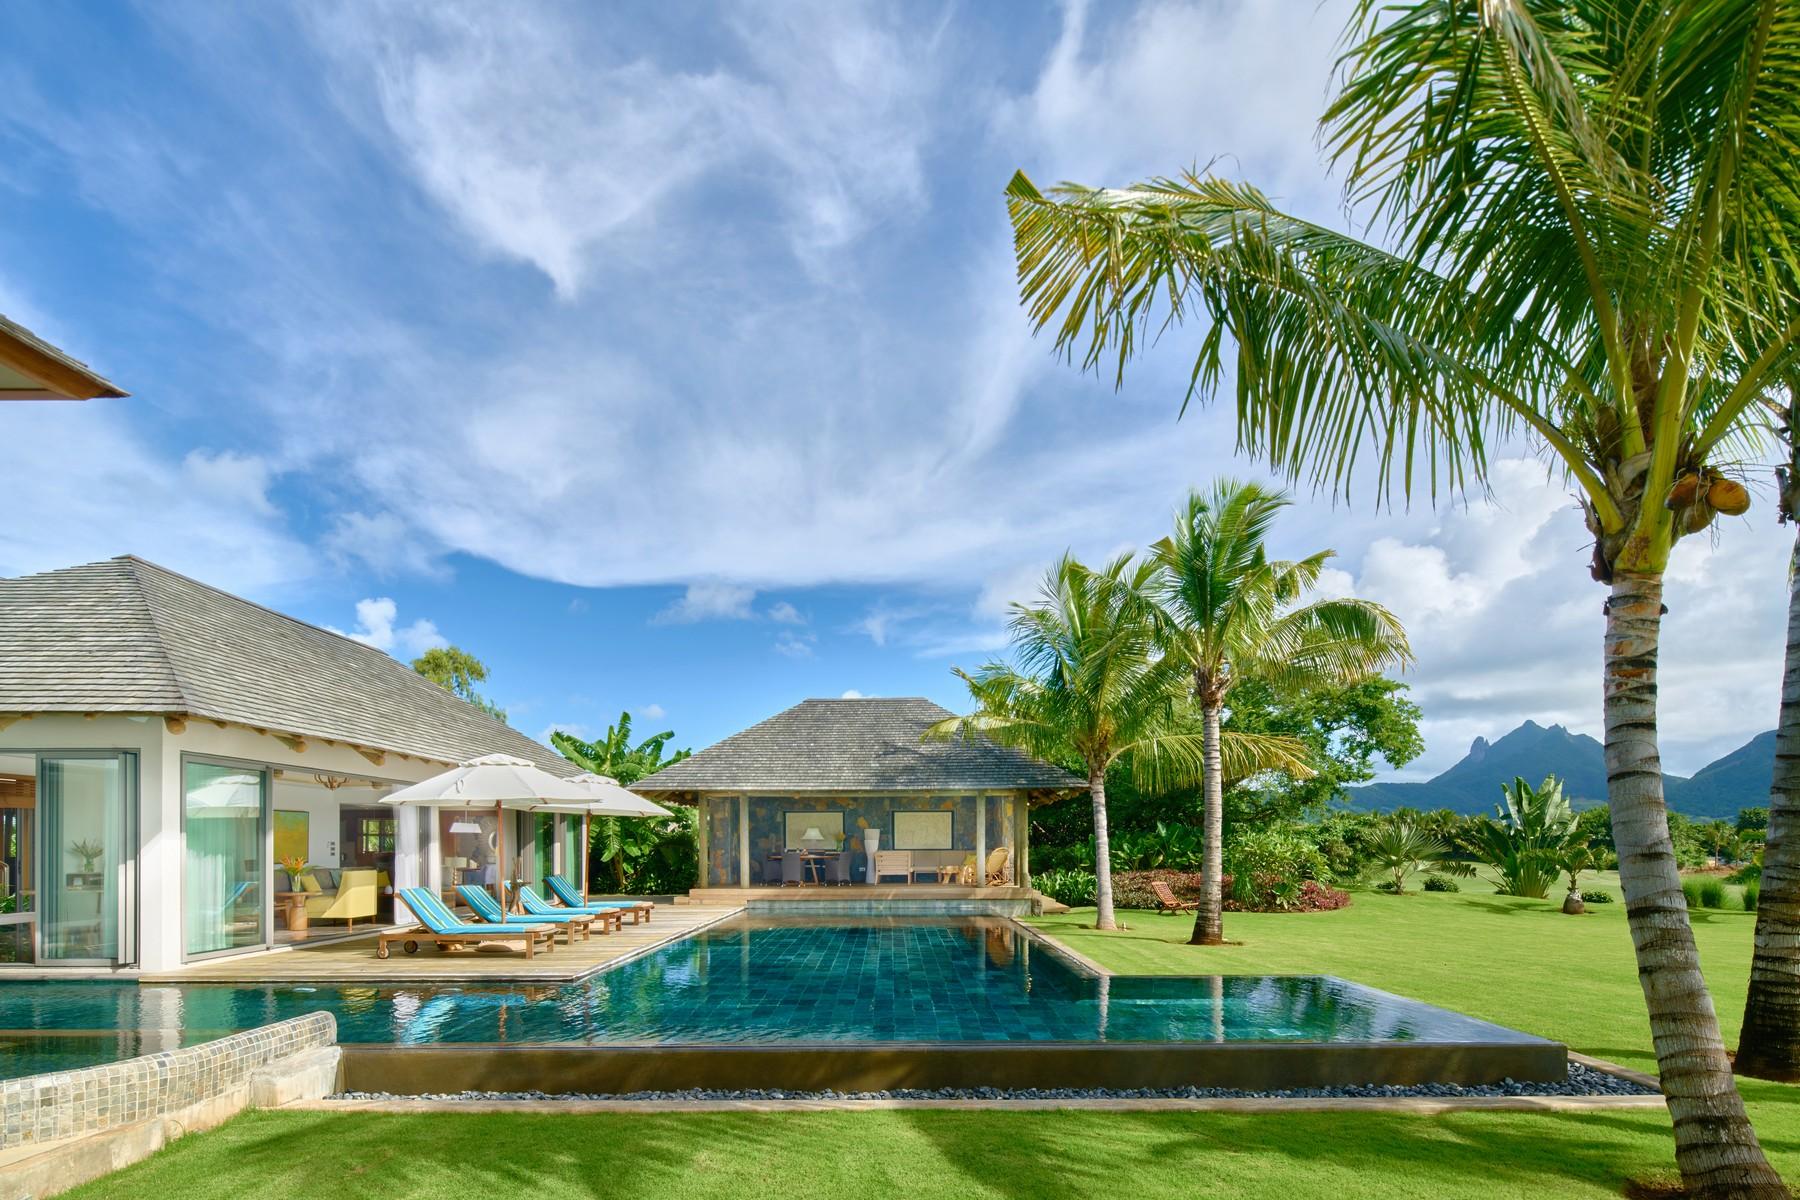 Single Family Home for Sale at Sprawling Golf Estate, Solaila Anahita Other Grandport, Grandport, Mauritius